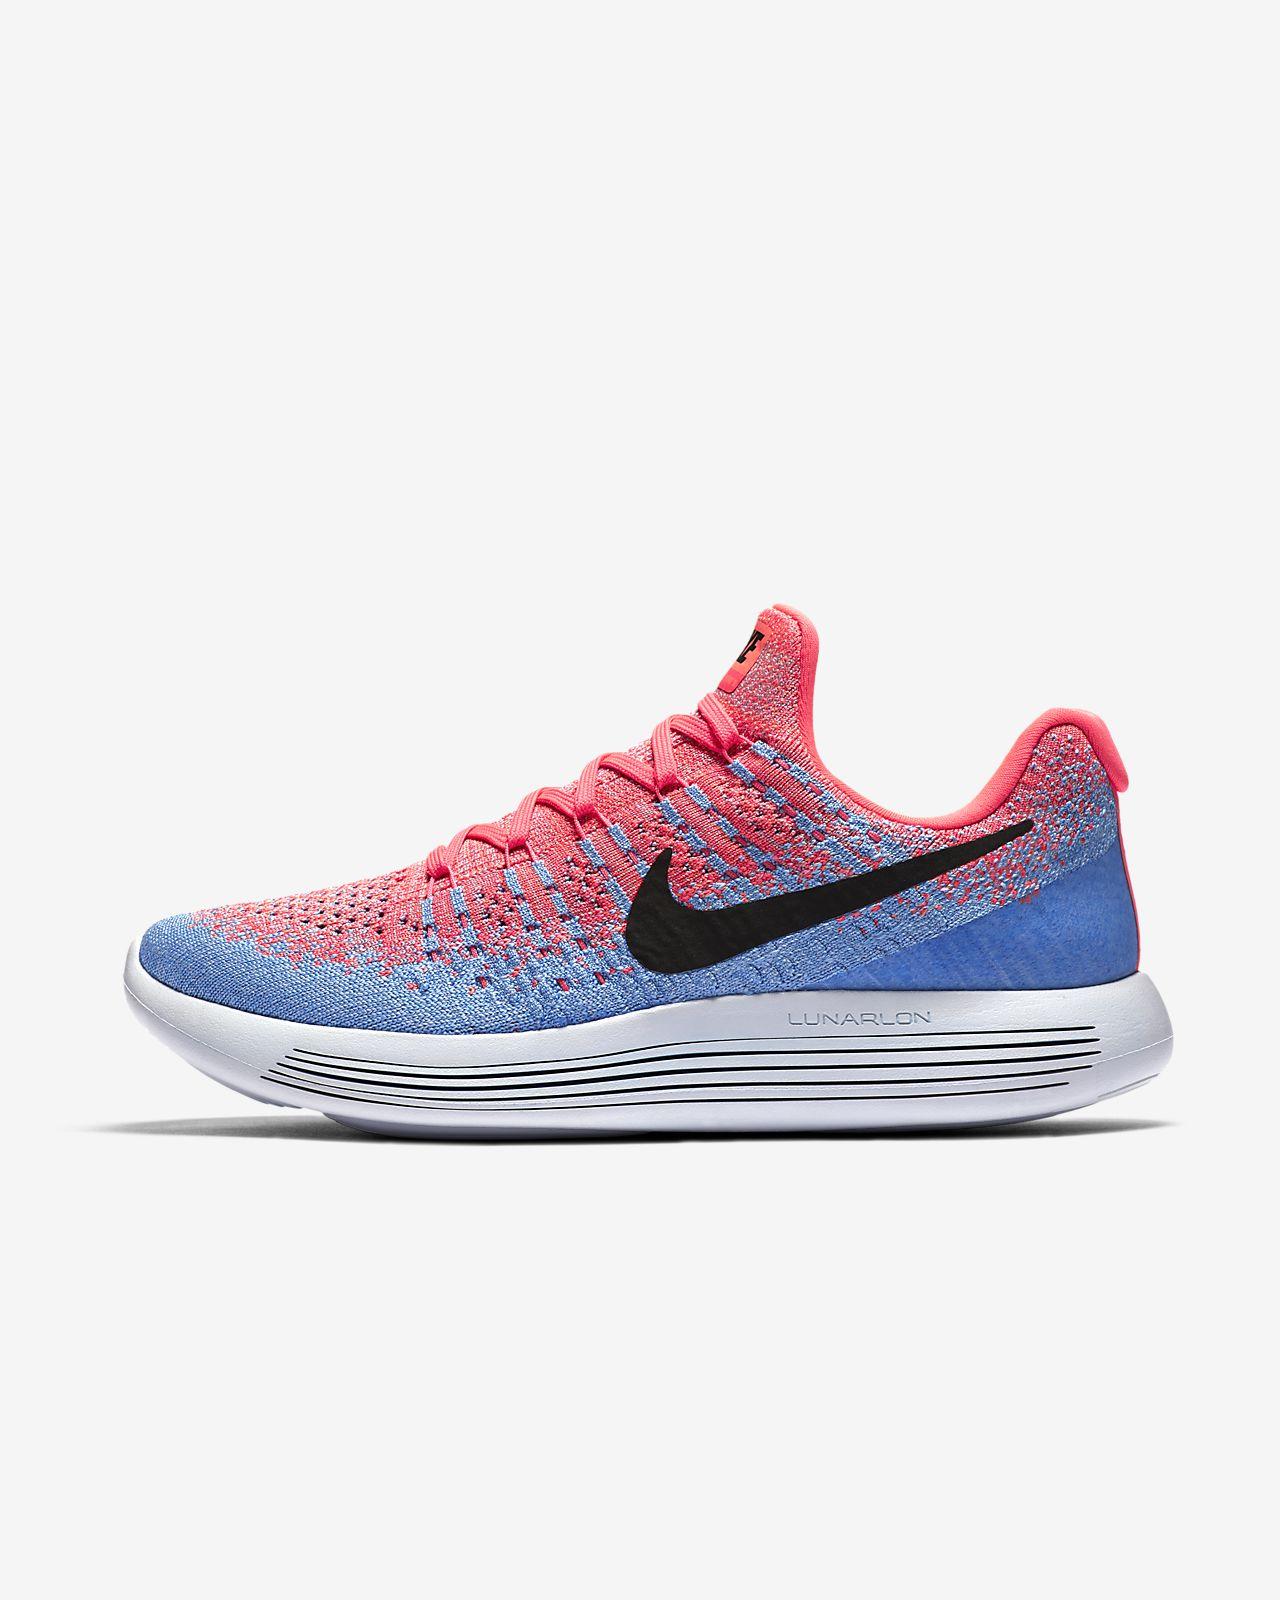 13b5d7e343af Chaussure de running Nike LunarEpic Low Flyknit 2 pour Femme. Nike ...